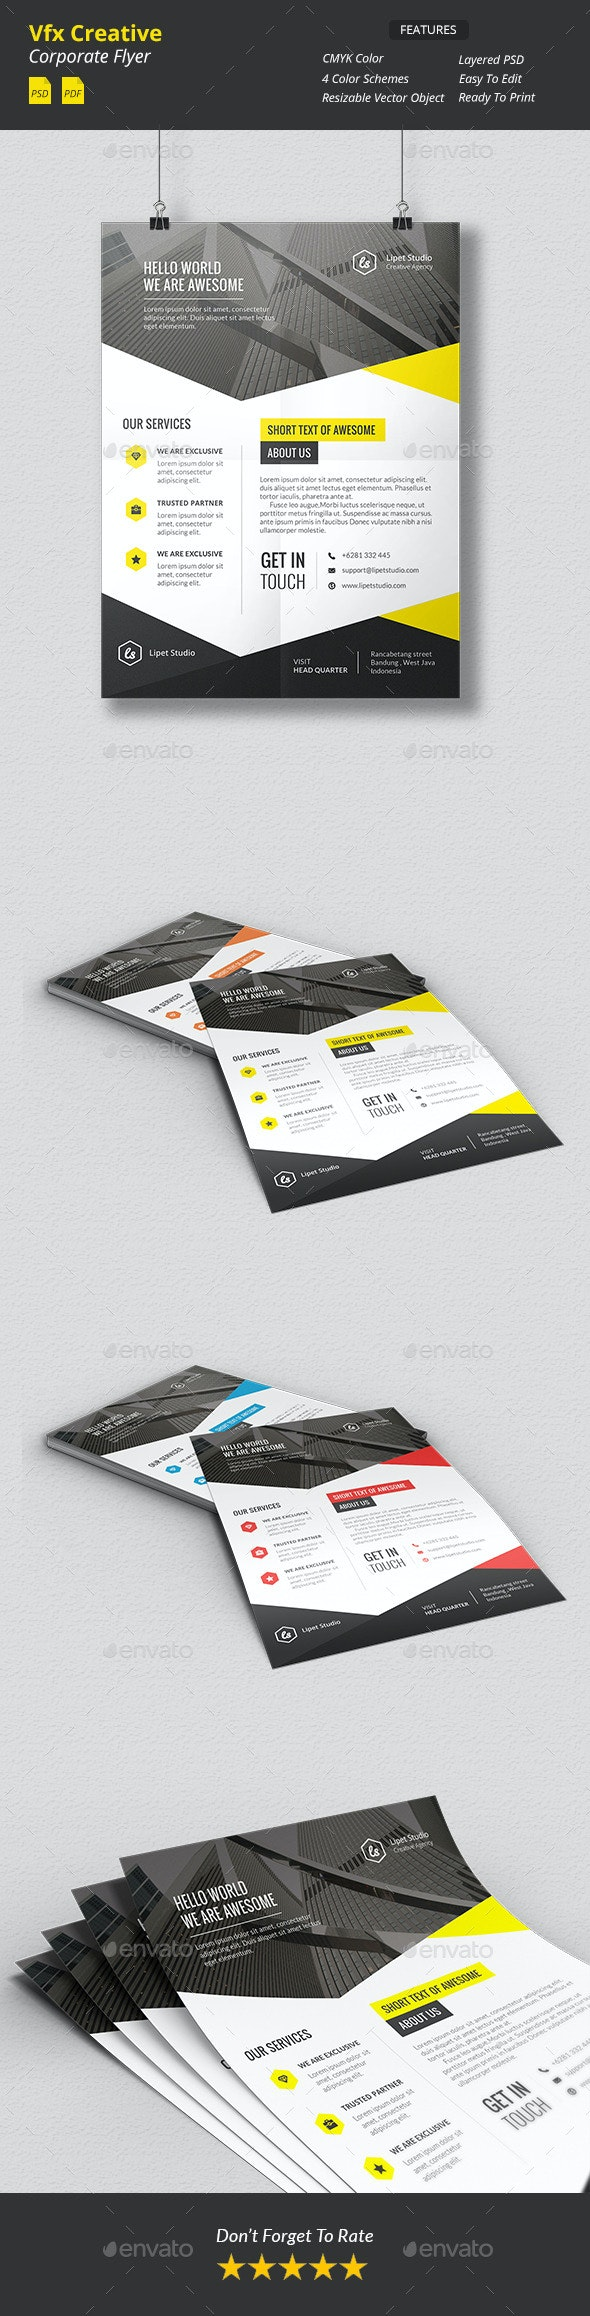 Vfx - Creative Corporate Flyer v1 - Corporate Flyers